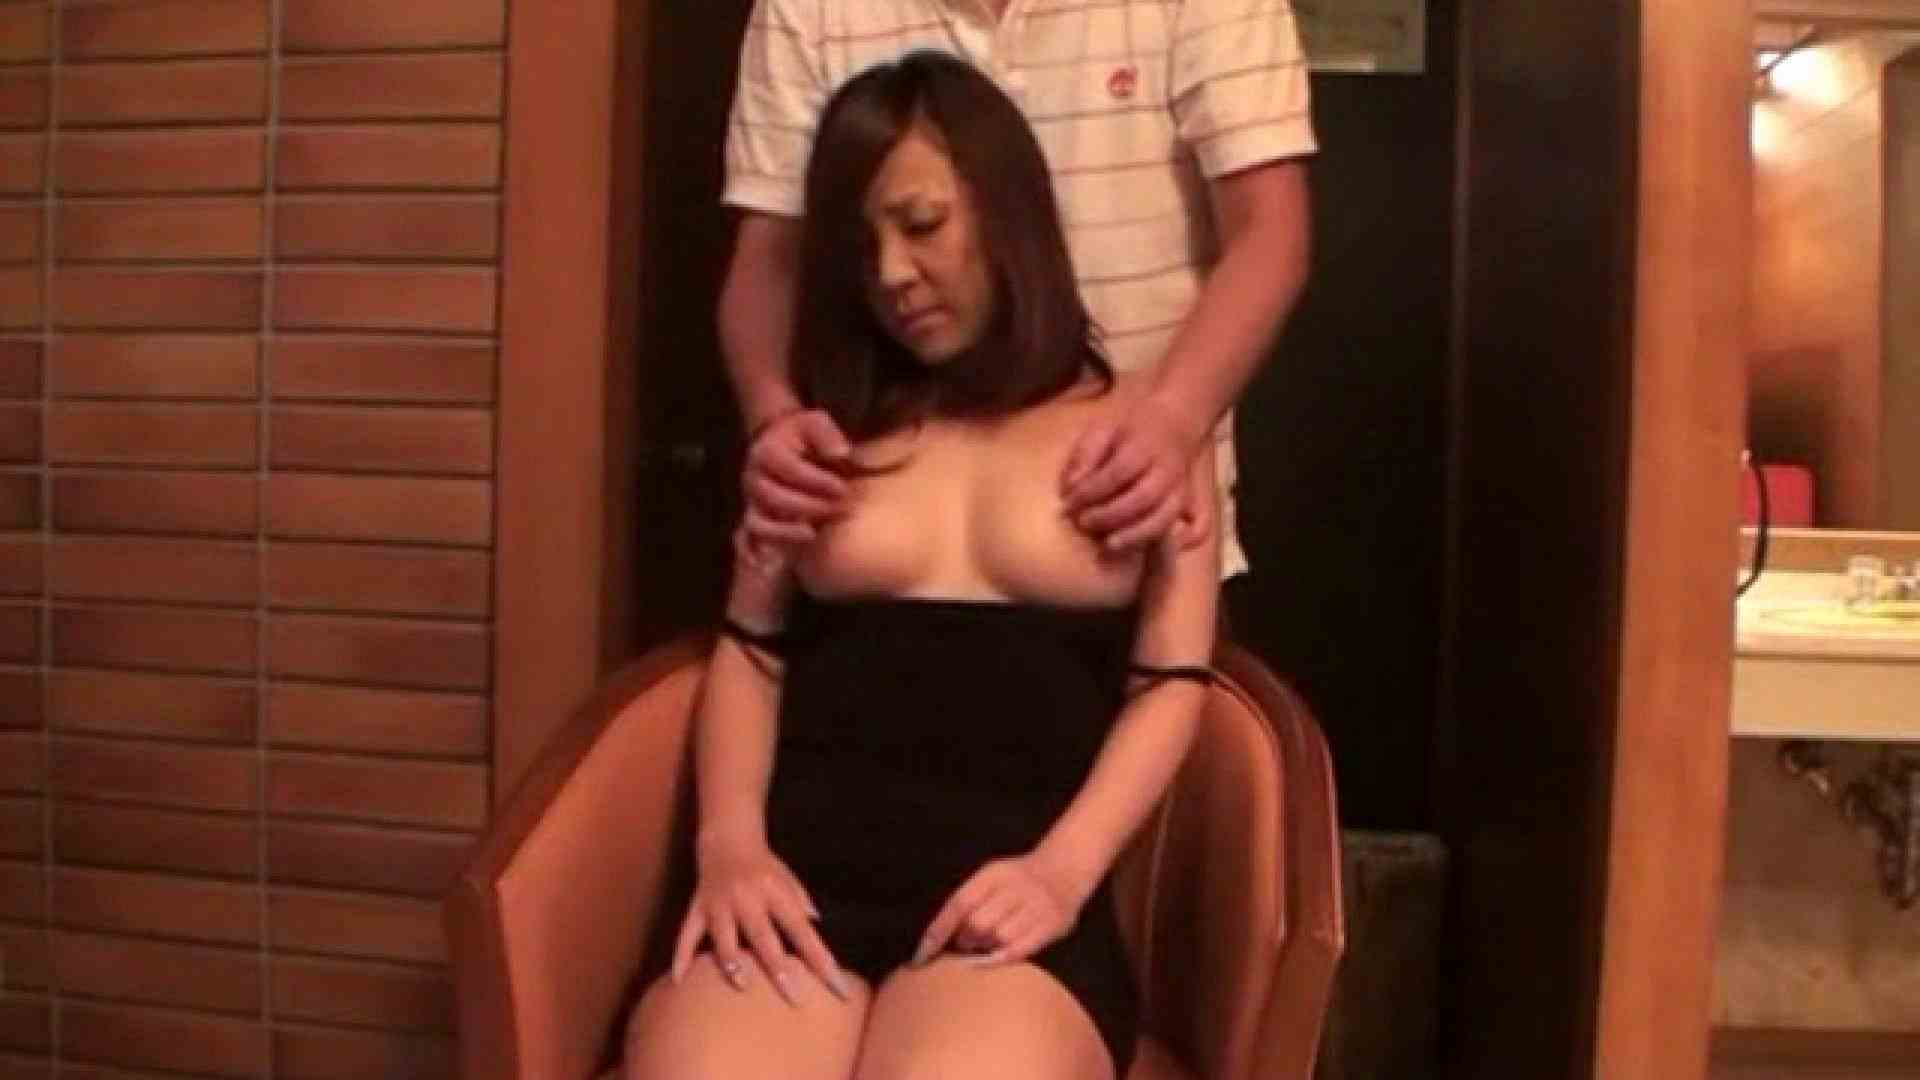 S級厳選美女ビッチガールVol.10 OLセックス  51画像 3